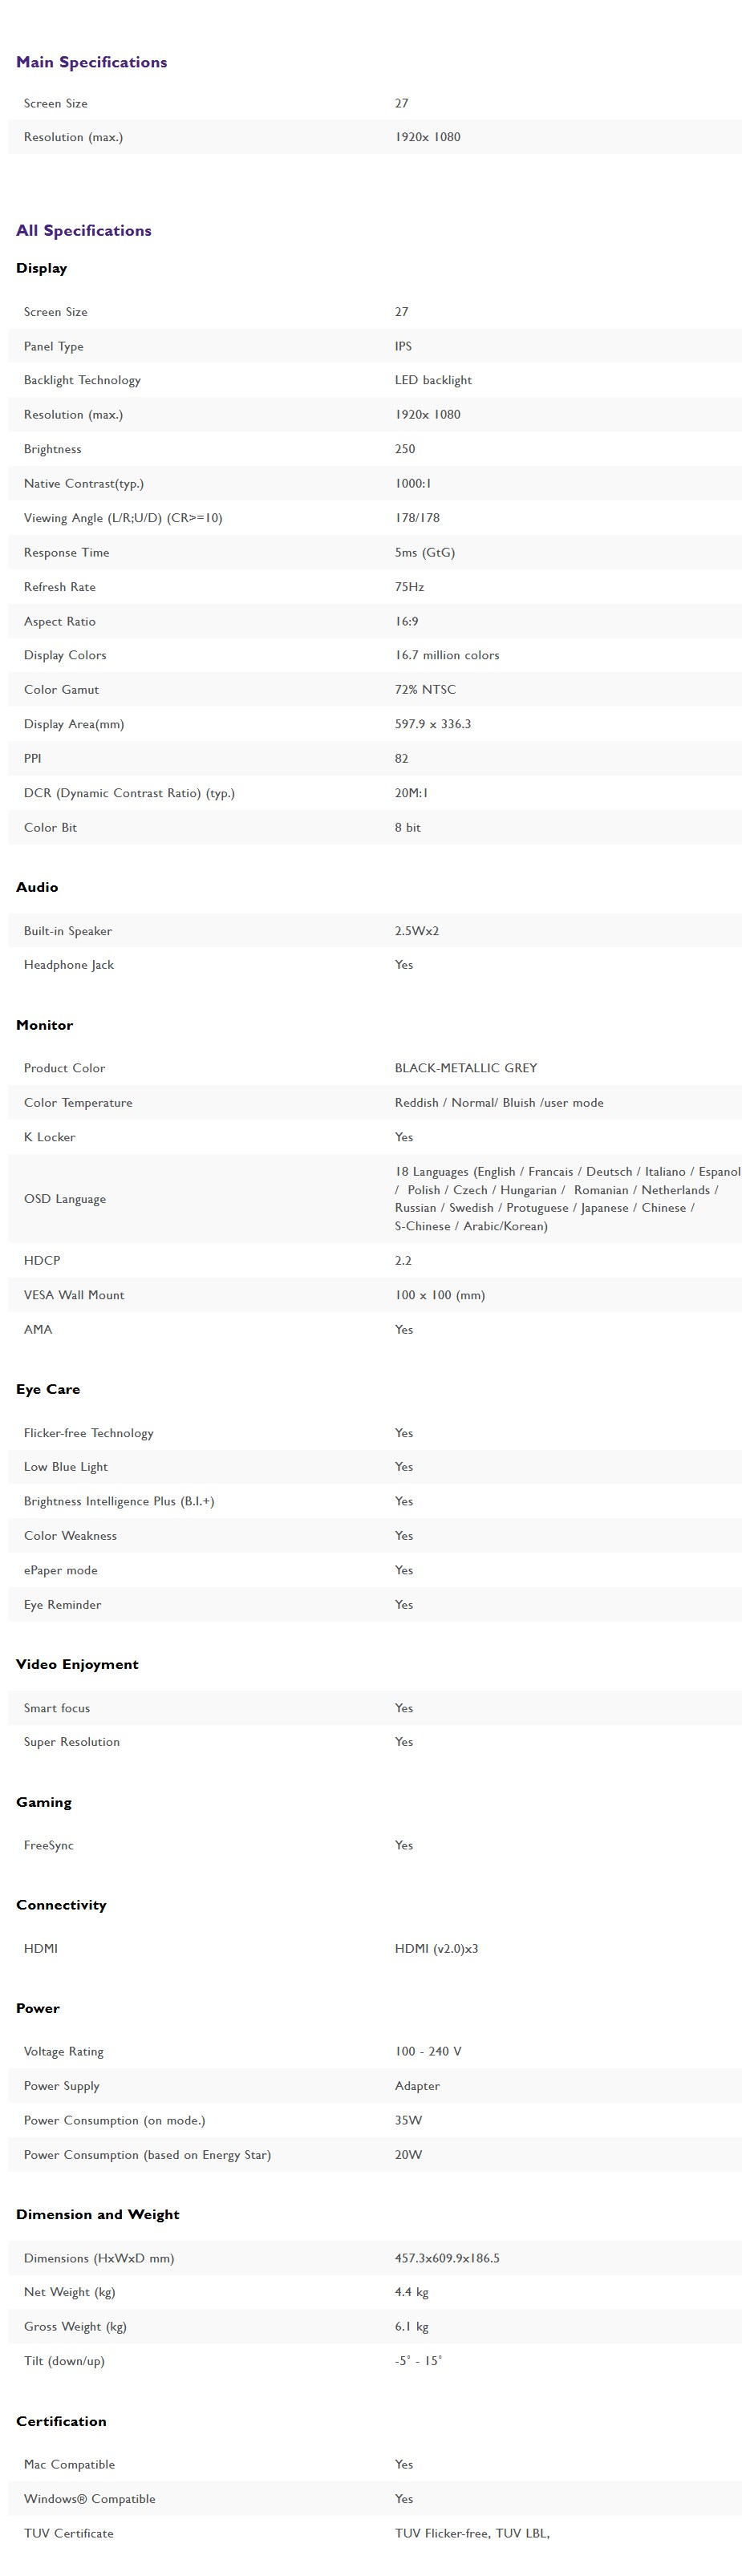 benq_ew2780_27_75hz_full_hd_hdr_eyecare_ips_monitor_ac35437_9.jpg